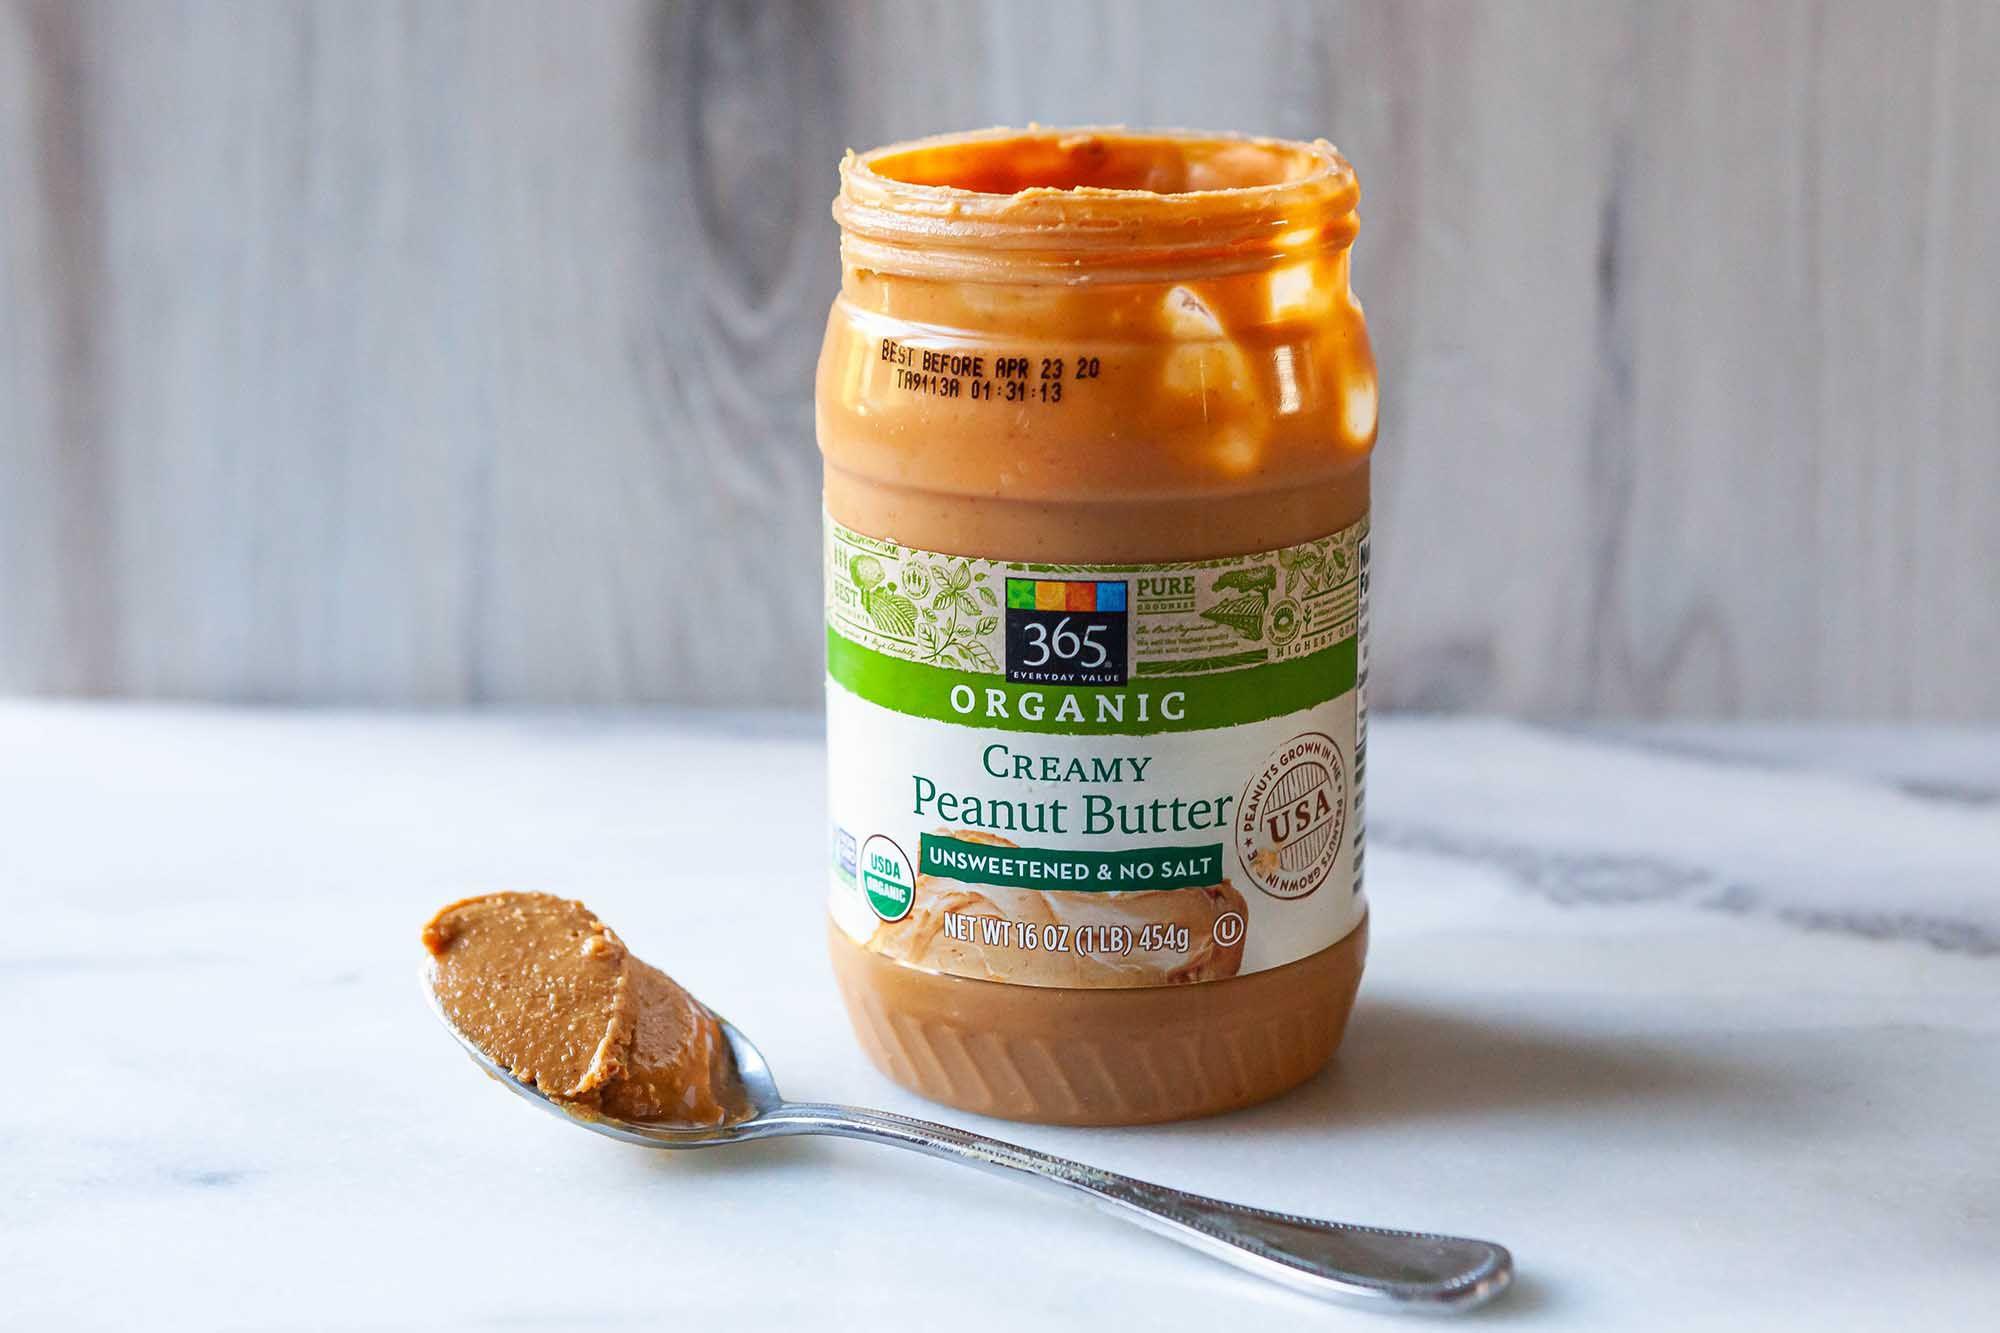 365 Organic Creamy Peanut Butter